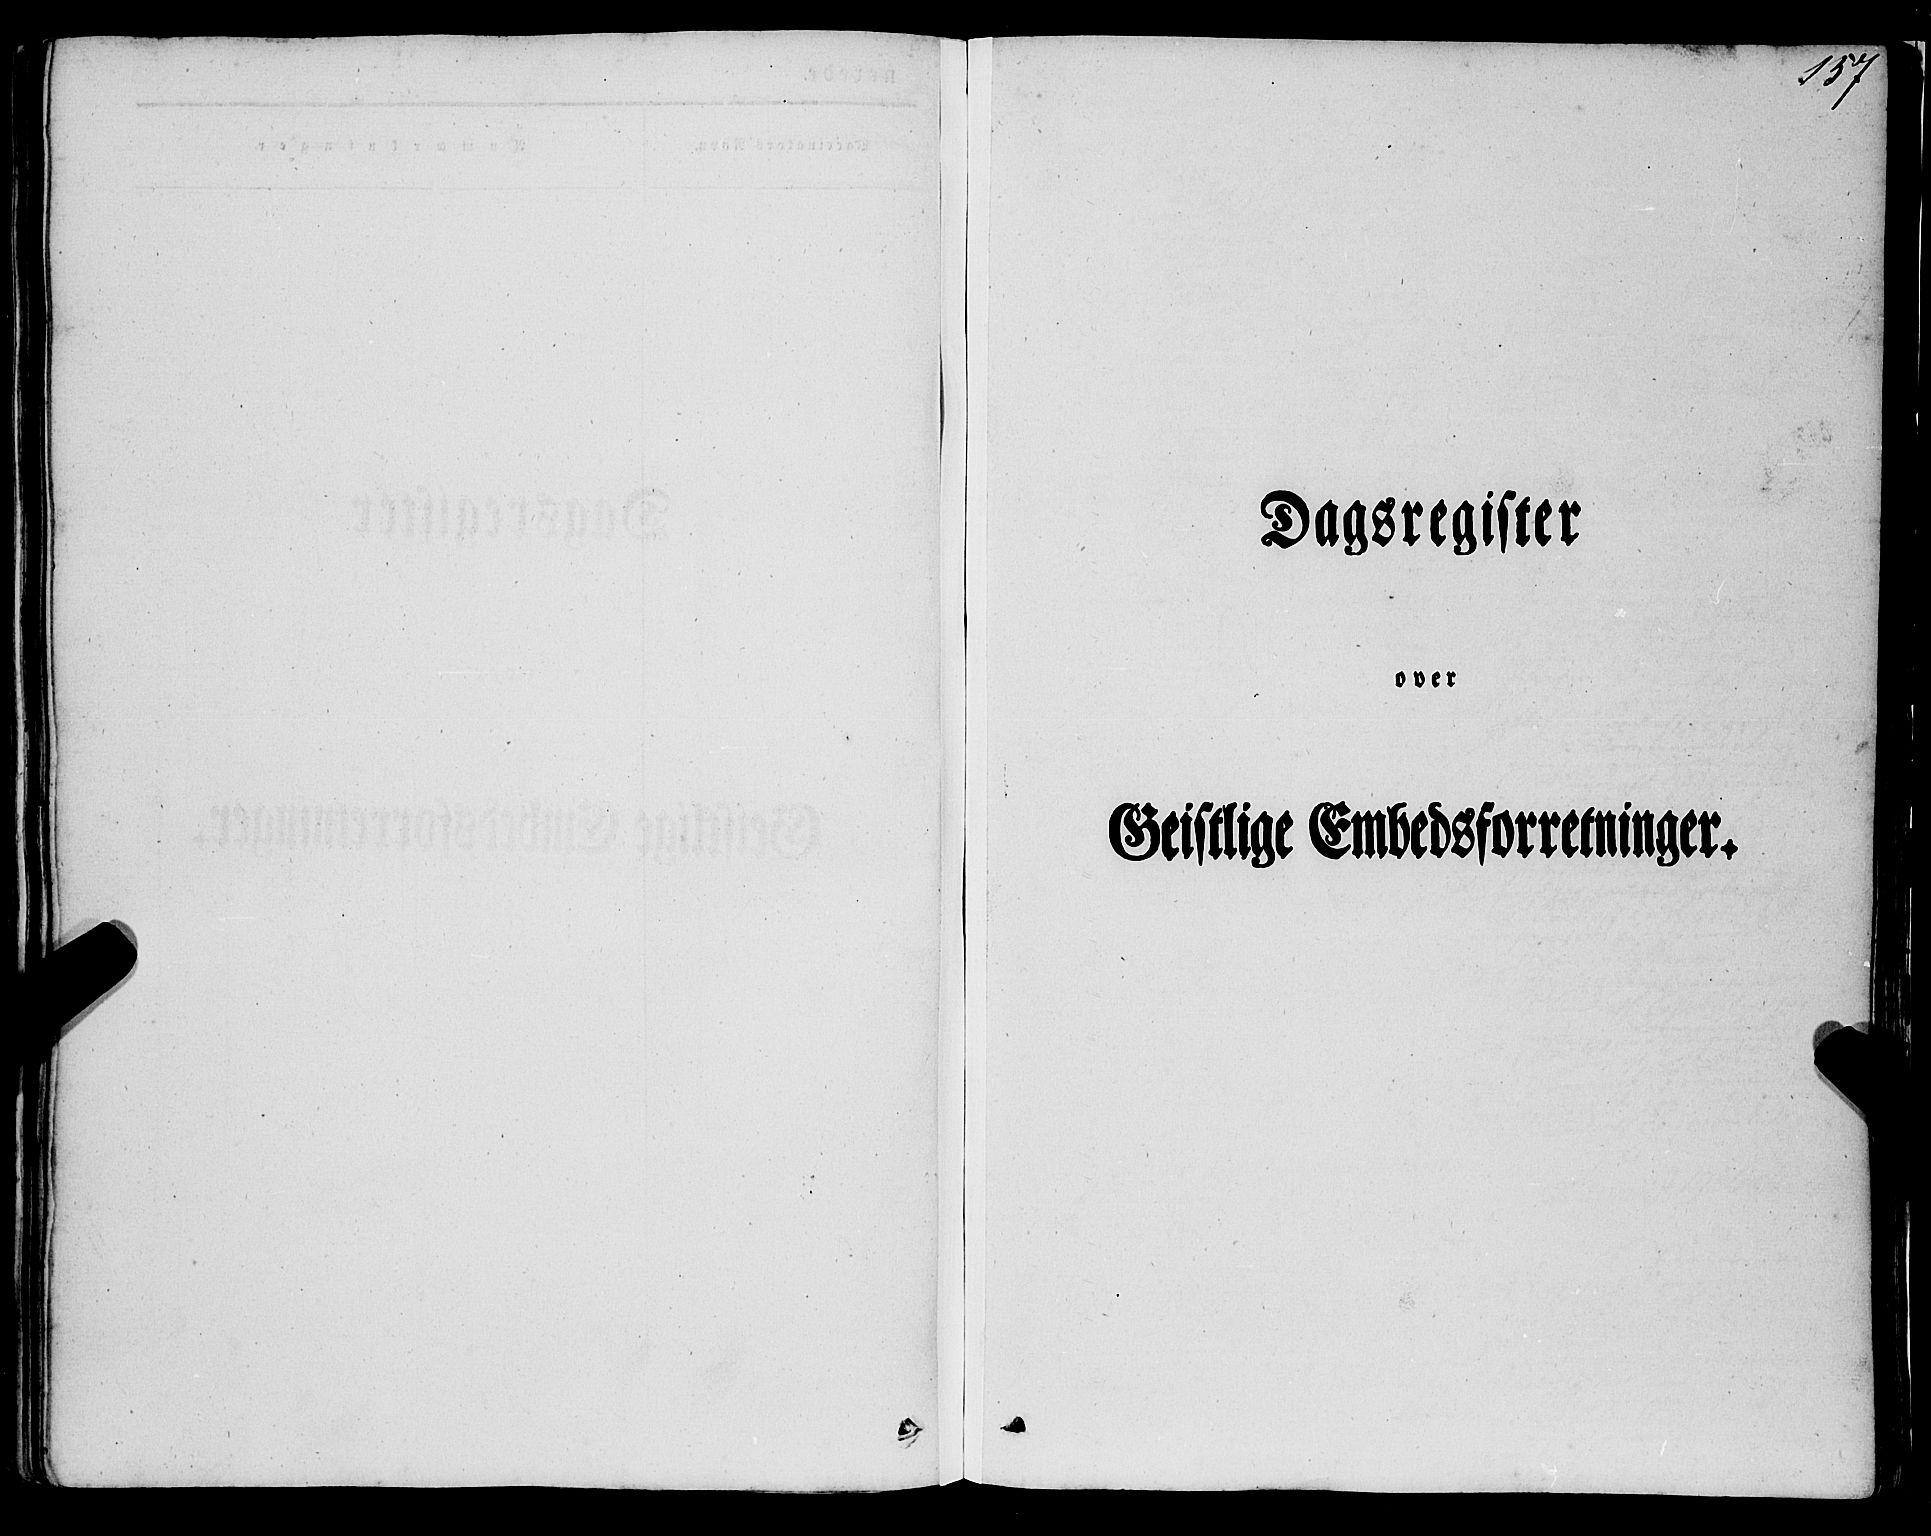 SAB, Mariakirken Sokneprestembete, H/Haa/L0006: Ministerialbok nr. A 6, 1846-1877, s. 157